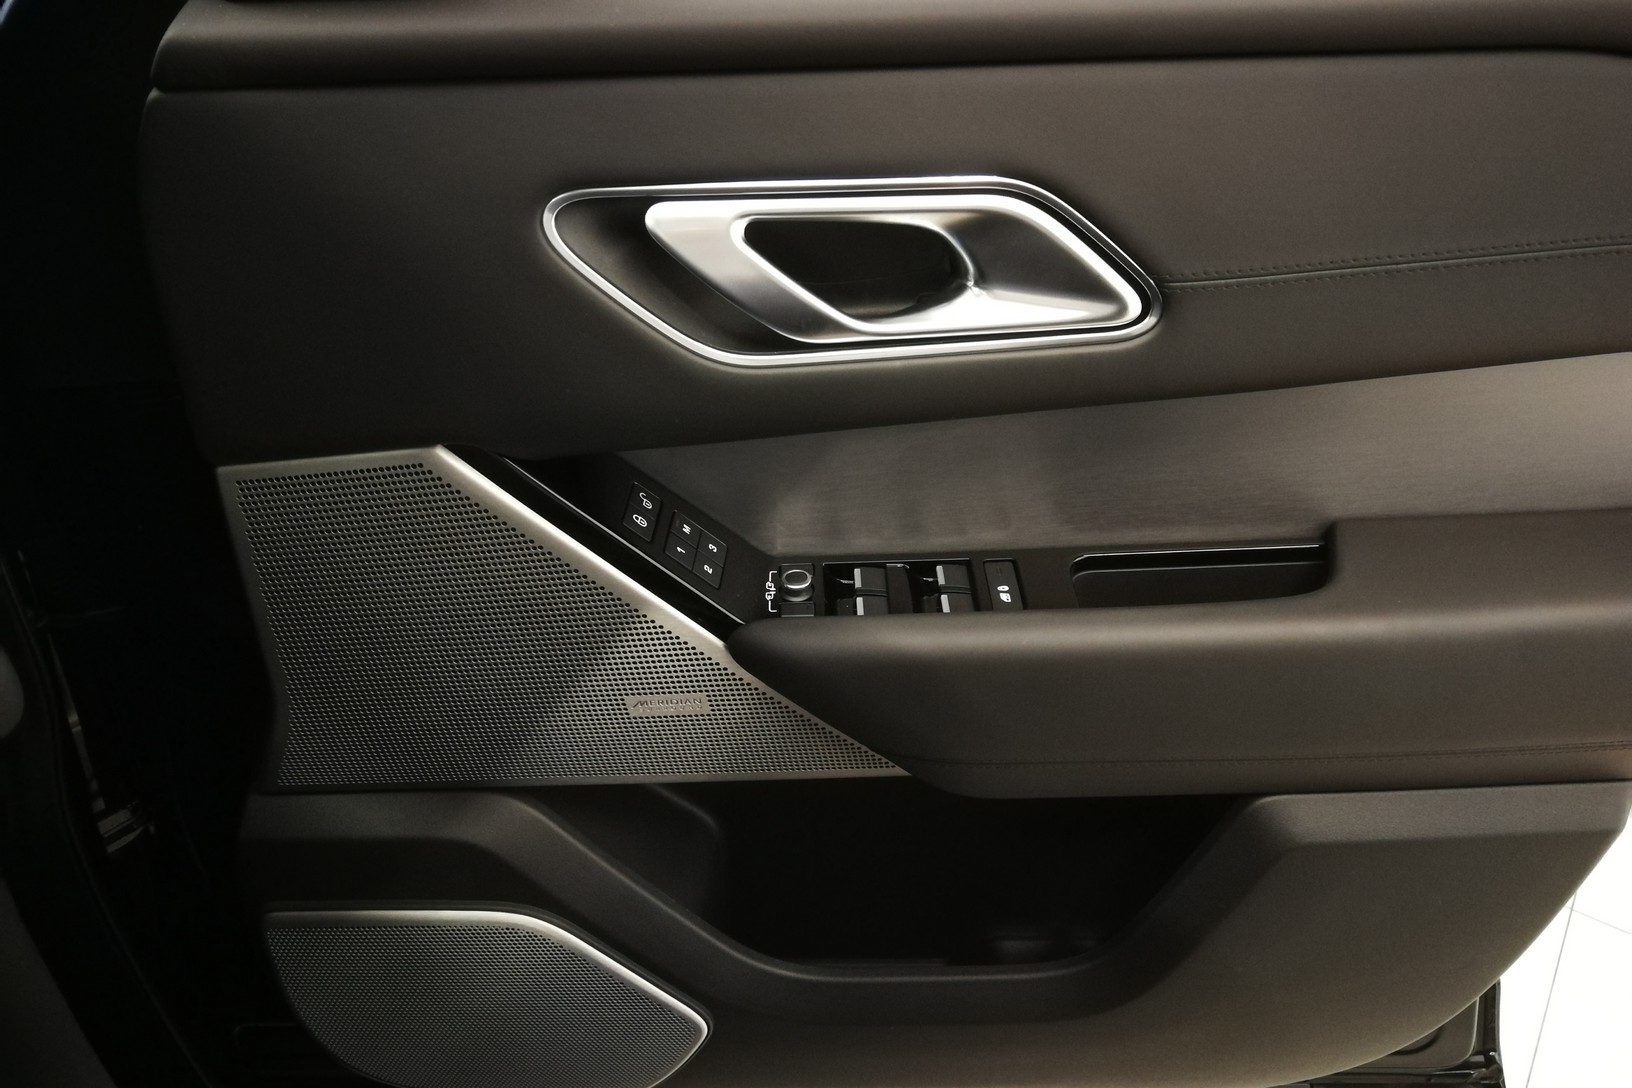 Land Rover Range Rover Velar 5.0 P550 SVAutobiography Dynamic Edition image 16